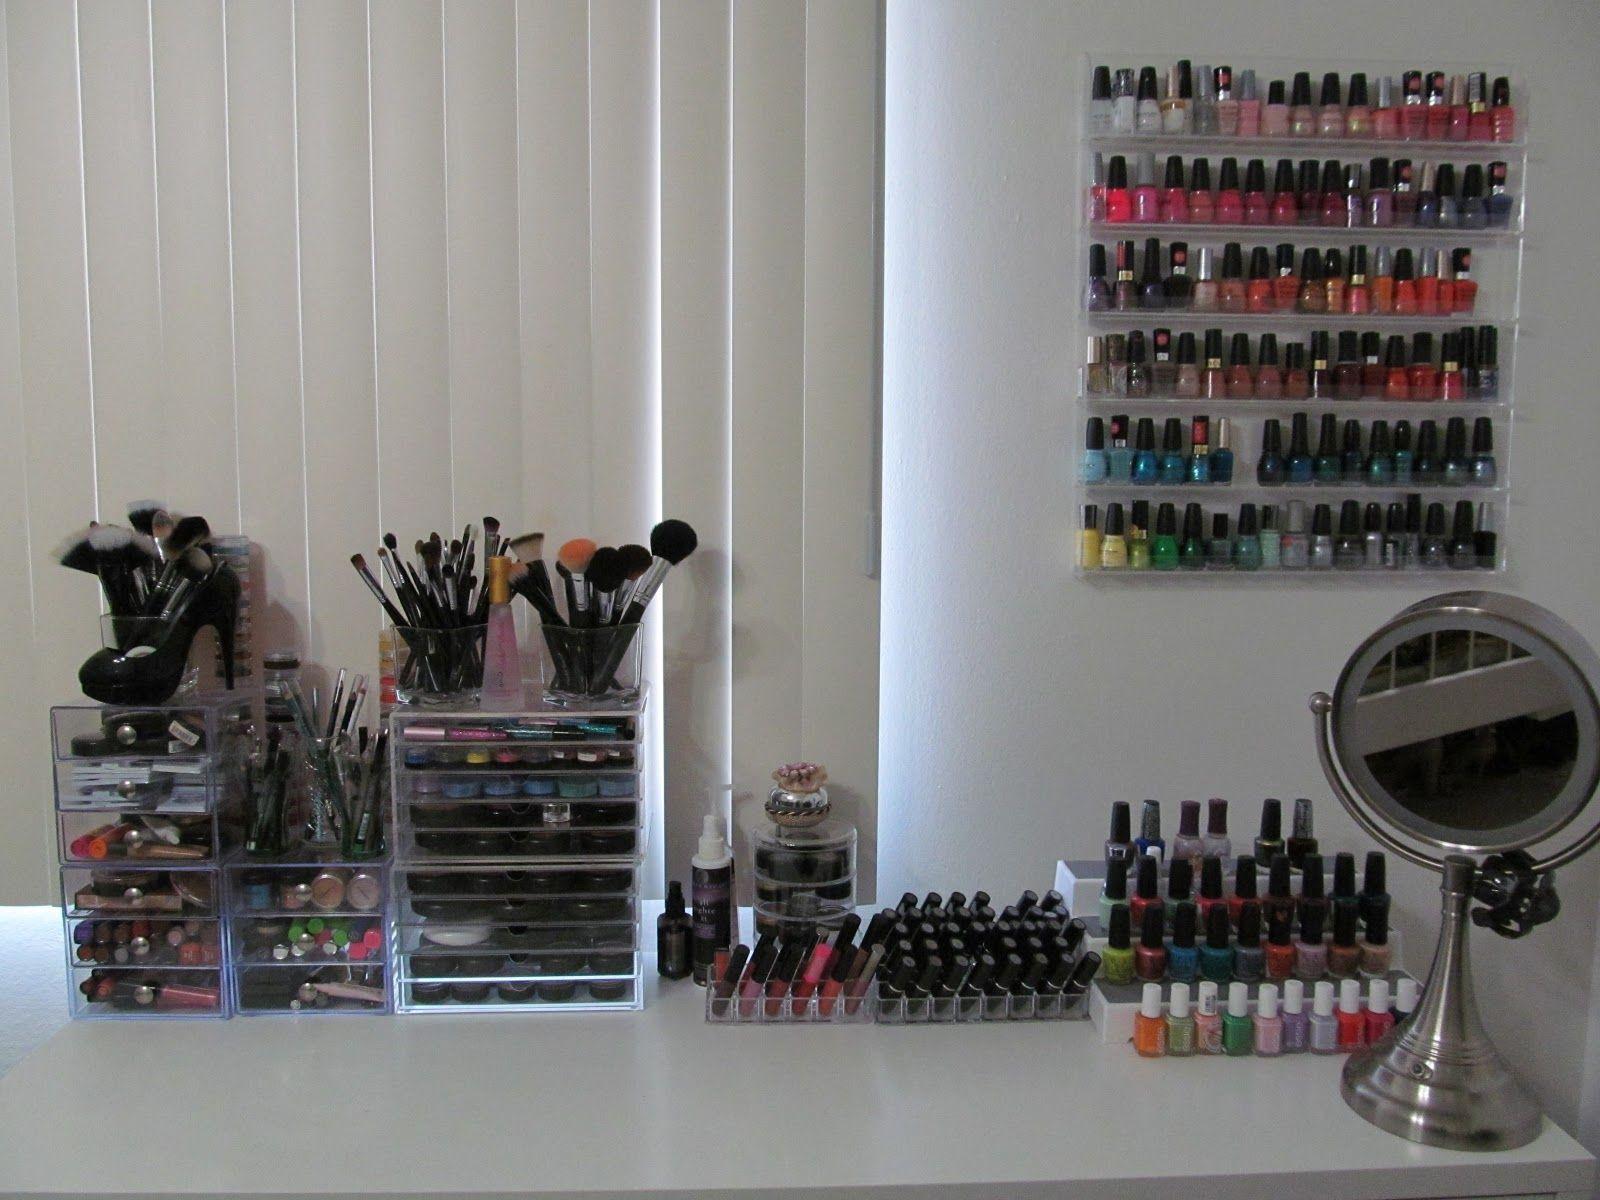 Best Images About Makeup Storage Ideas On Pinterest Storage - Makeup vanity ideas